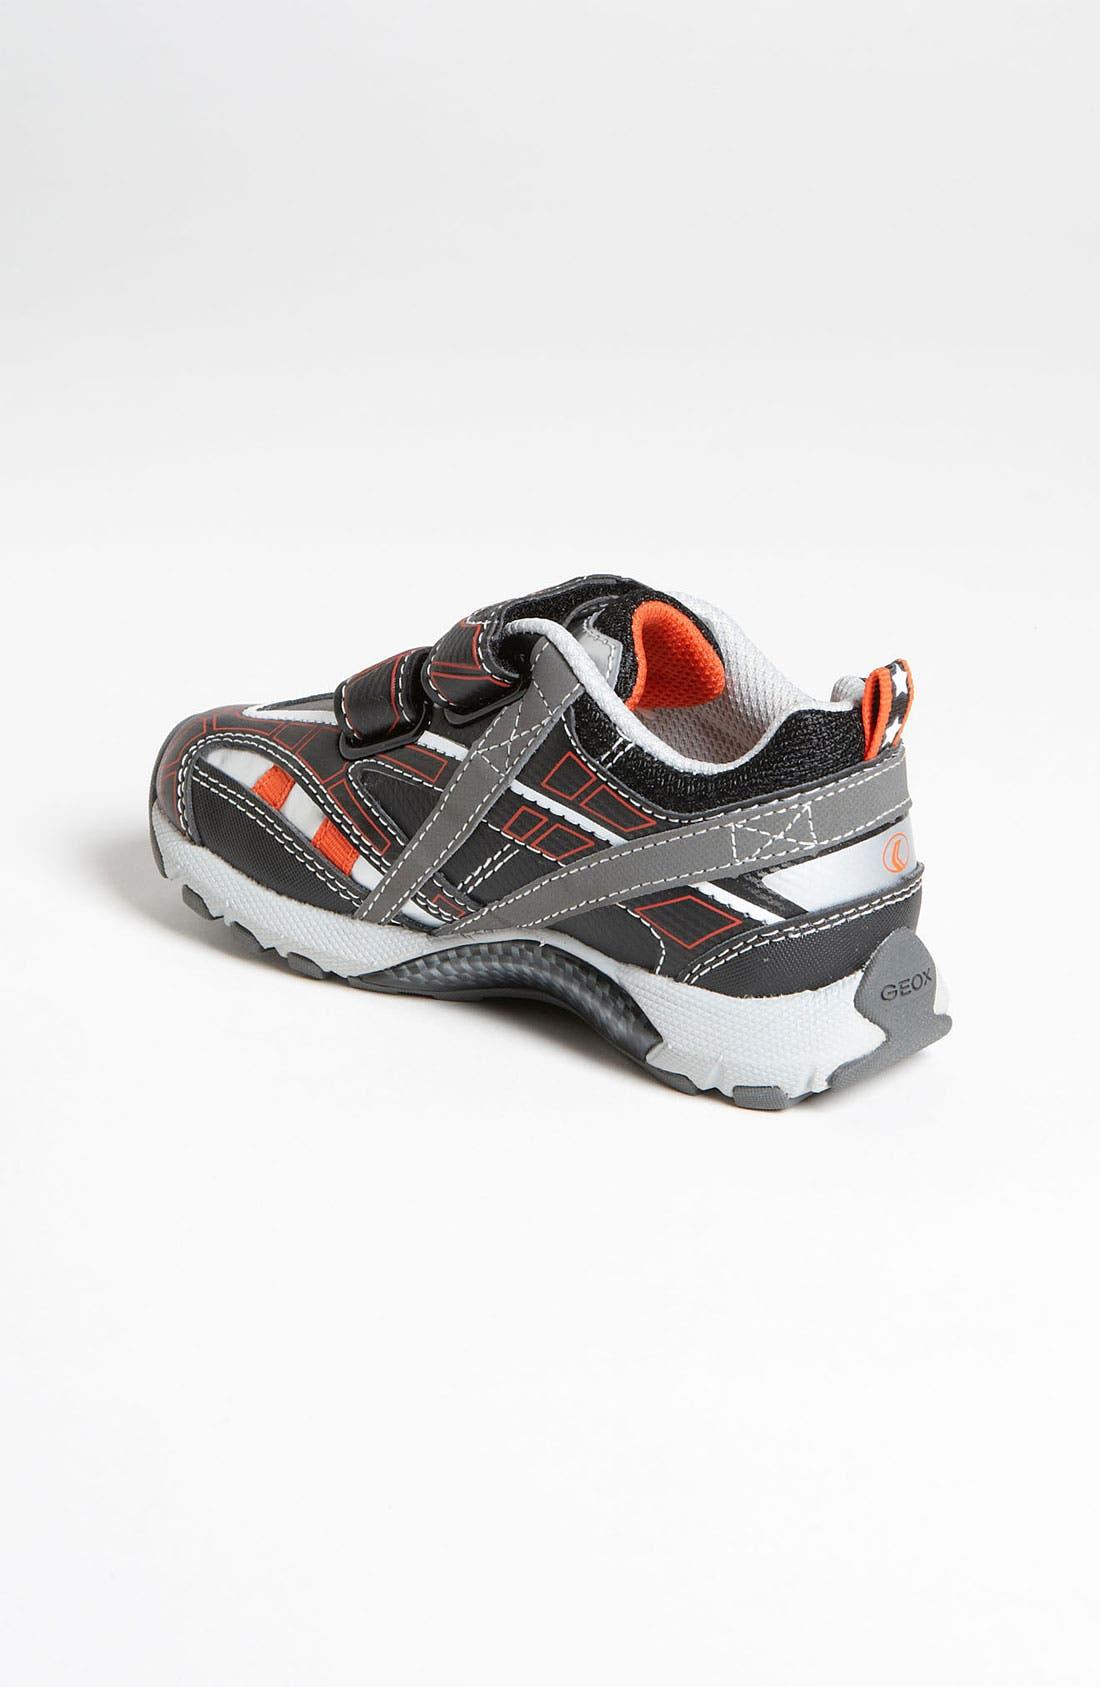 Alternate Image 2  - Geox 'Stark' Sneaker (Walker & Toddler)